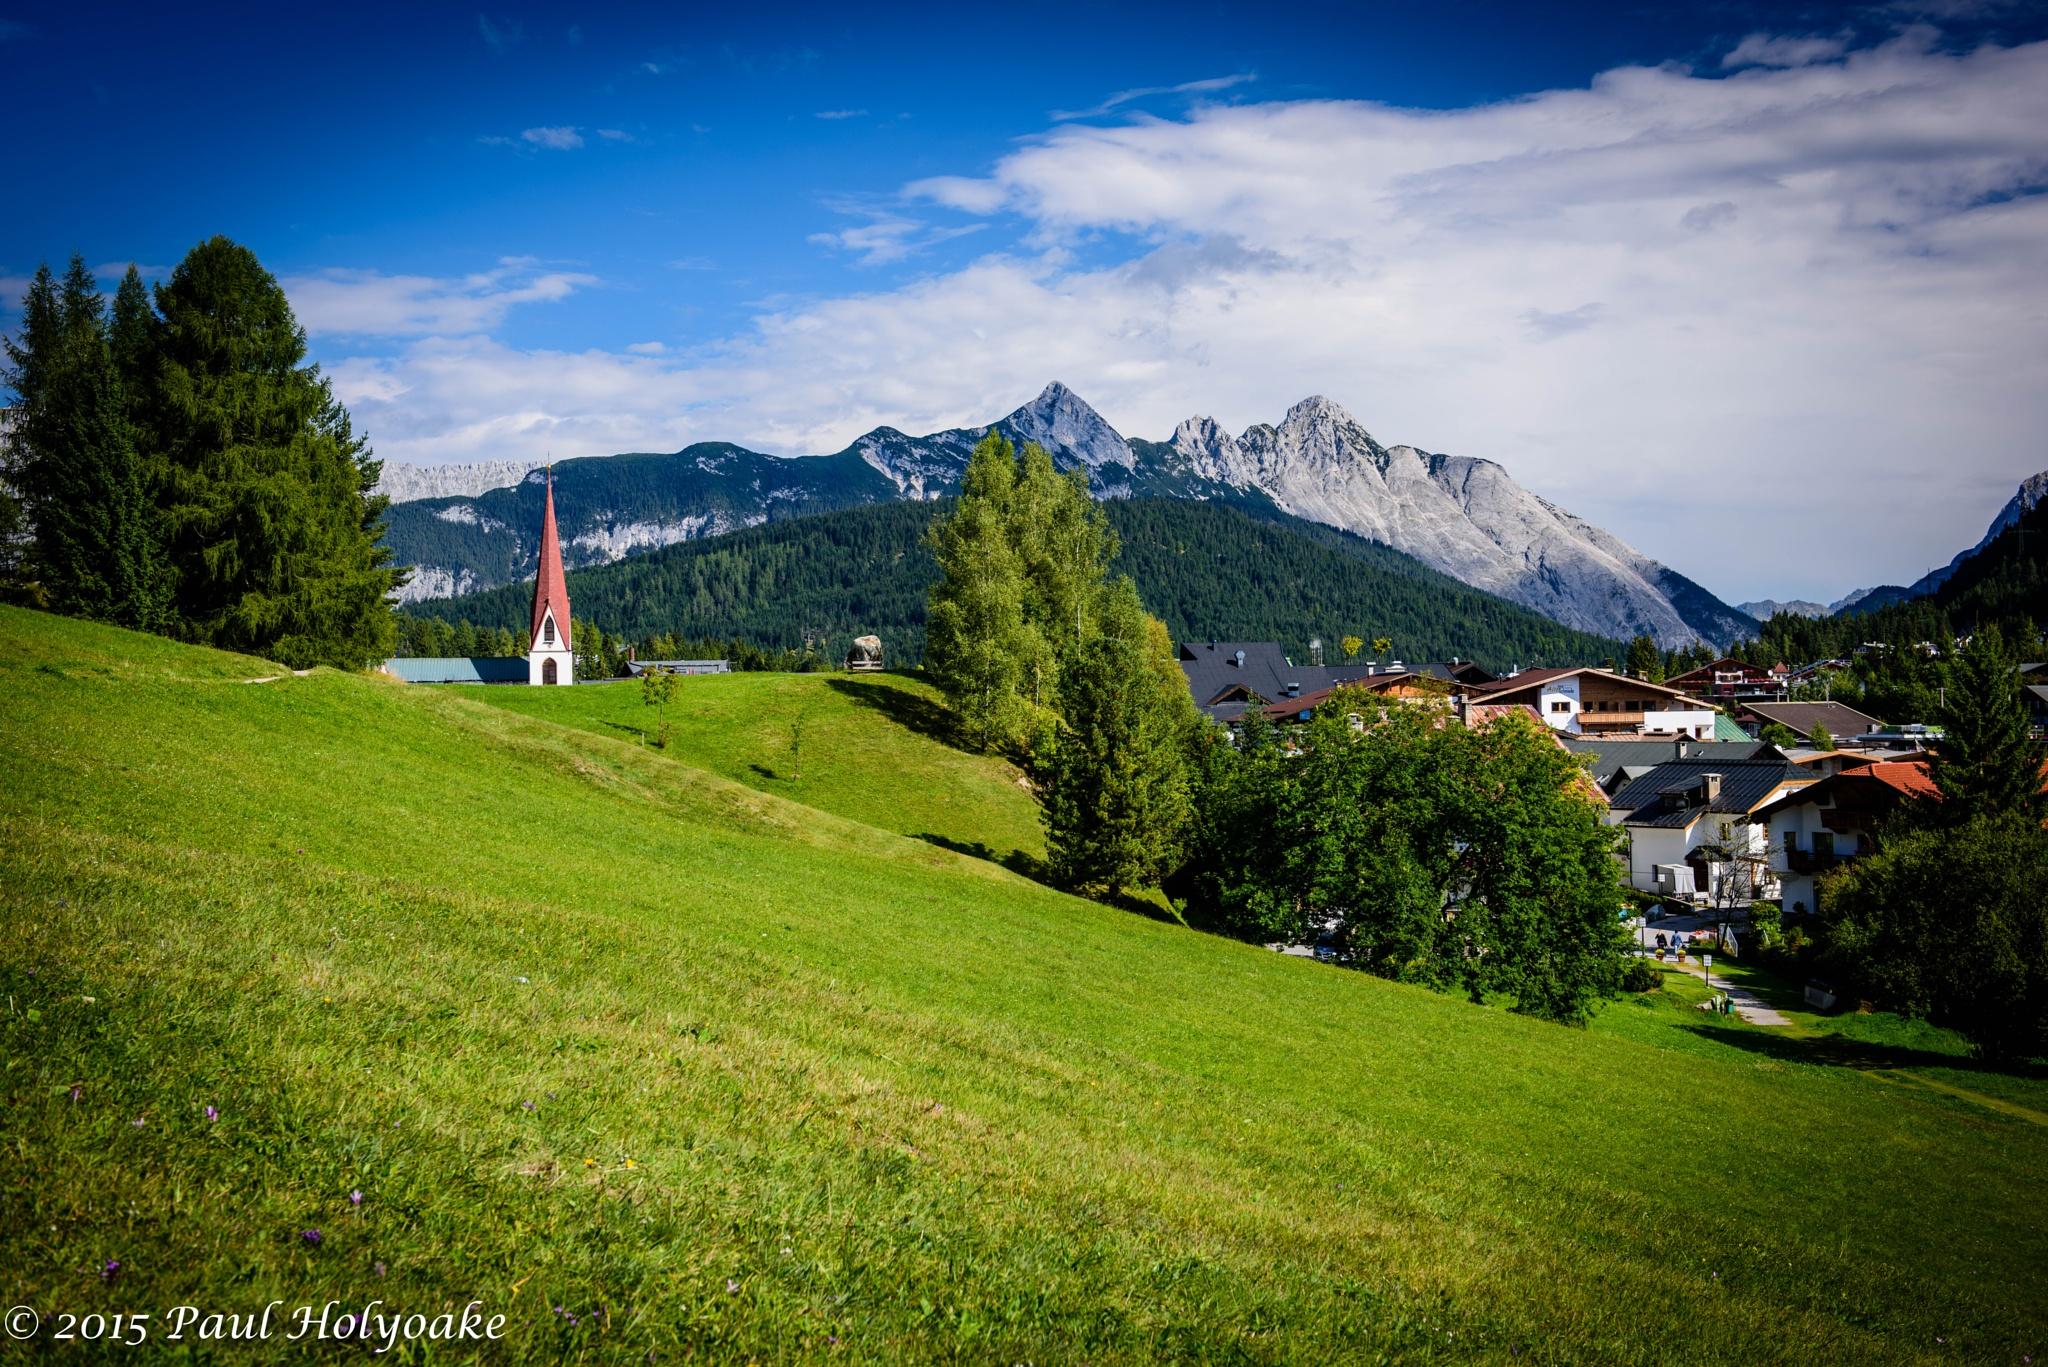 Tirol II by Photon